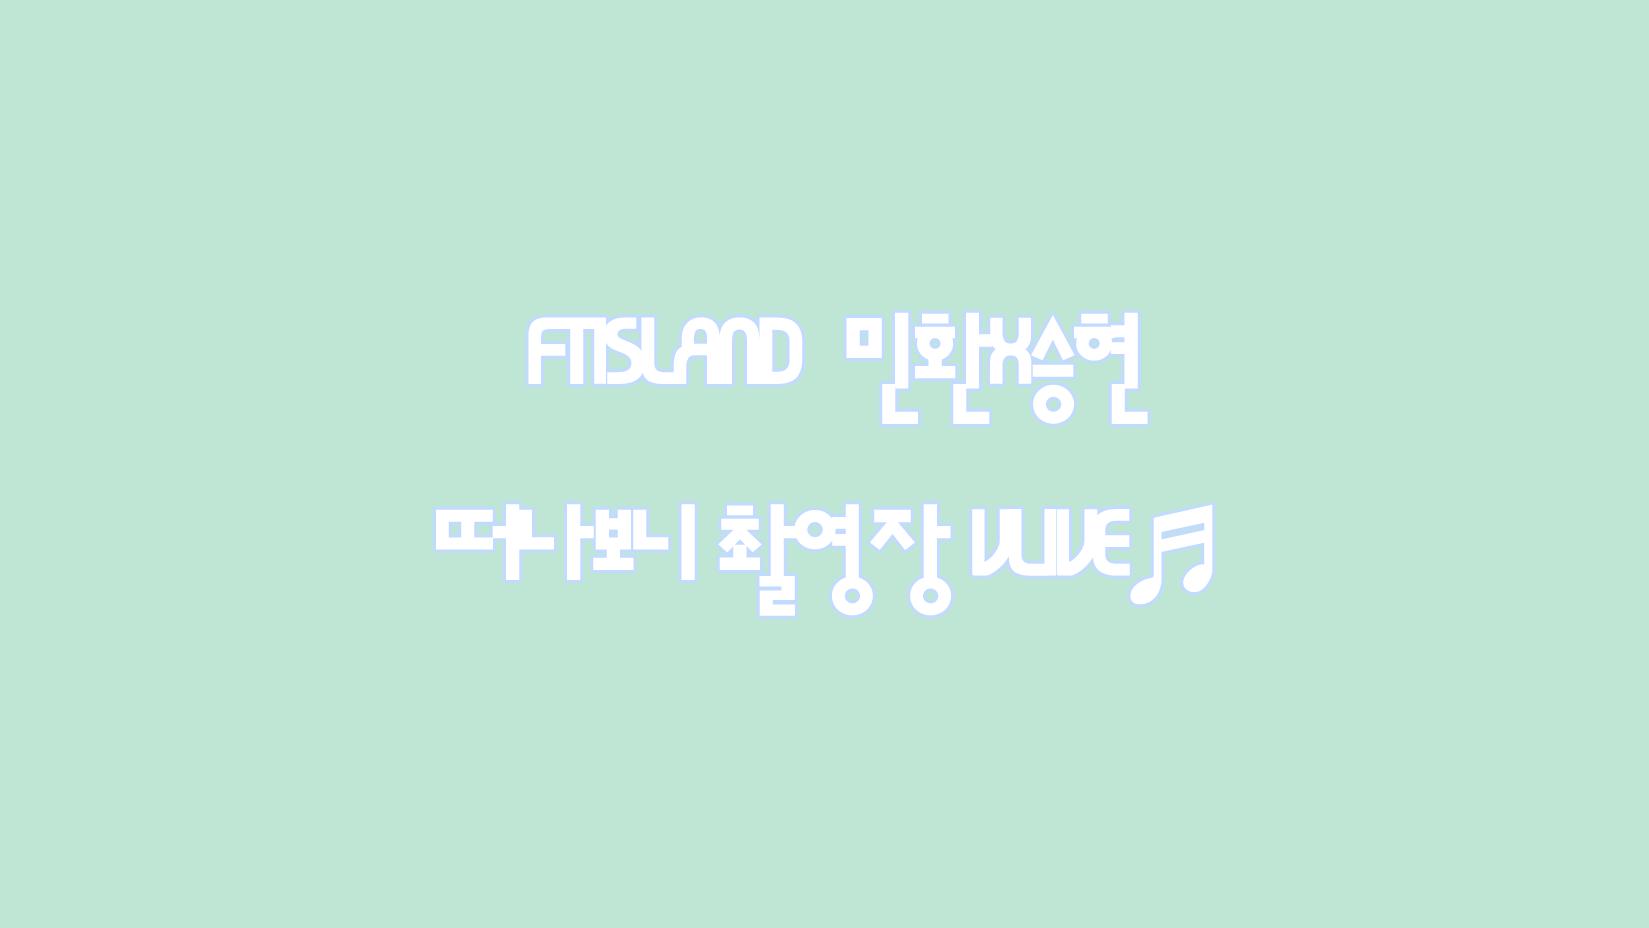 FTISLAND 민환&승현 먹방 대구 여행기♬ (SBS PLUS 떠나보니 촬영장)